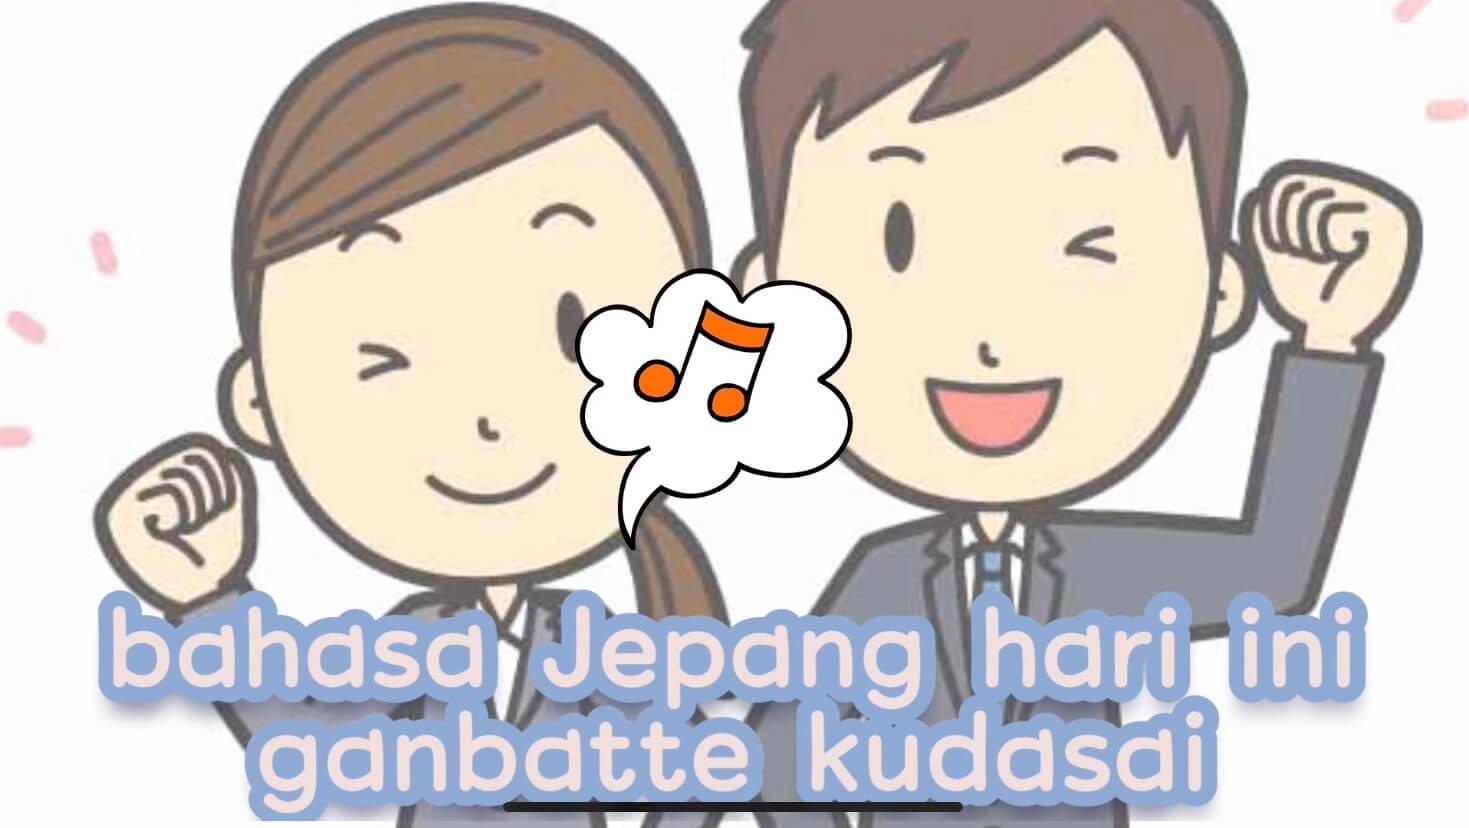 Ganbatte kudasai (Semangat) – Belajar Bahasa Jepang